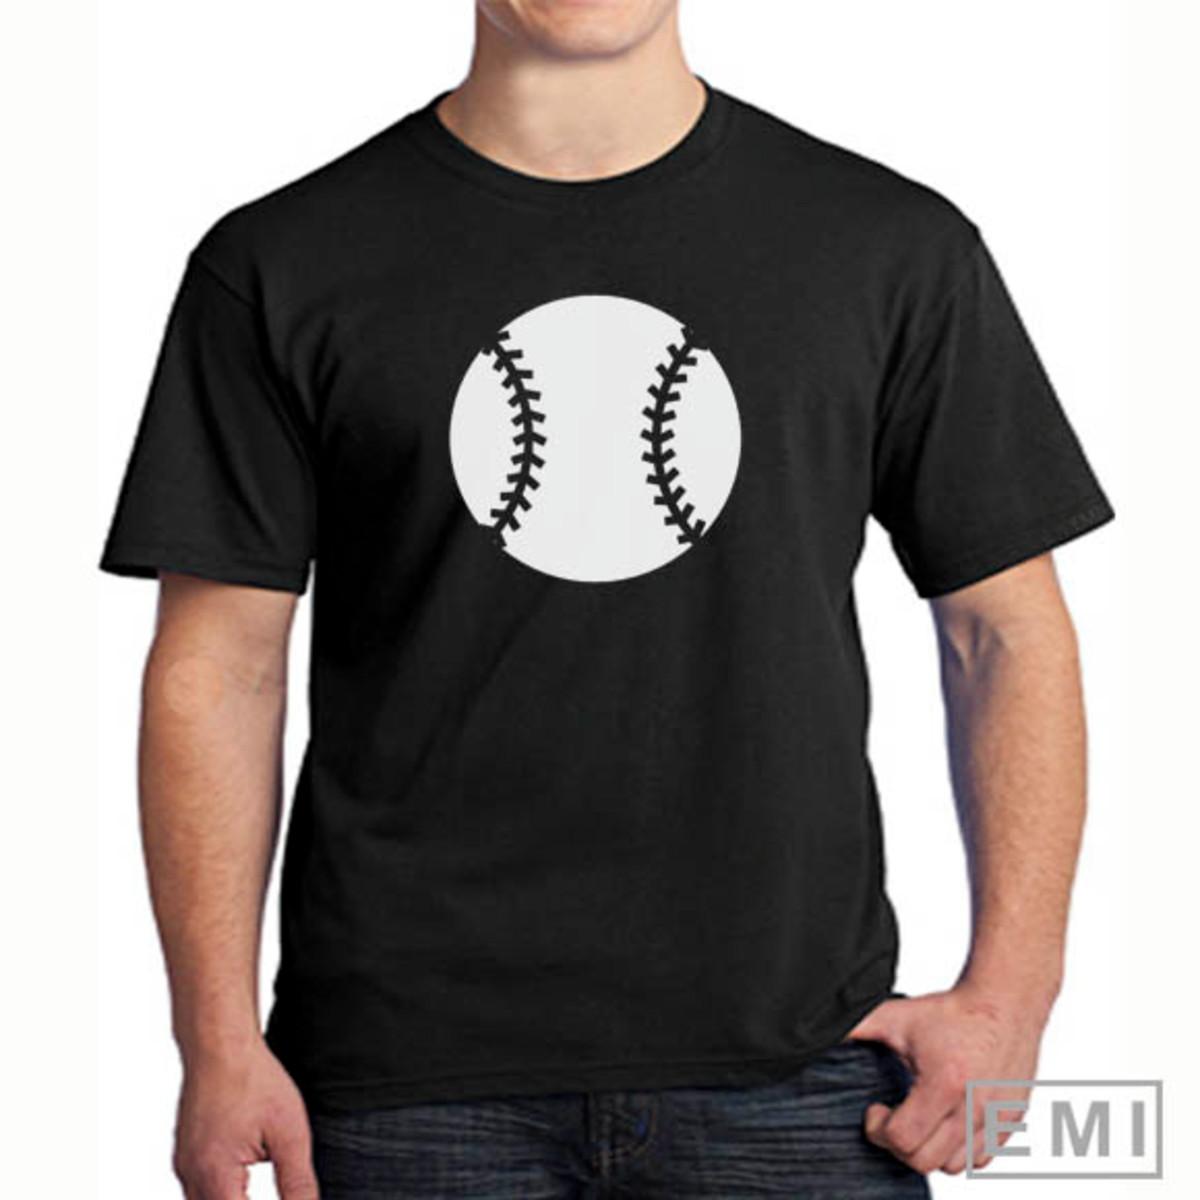 32fe334e279e6 Camiseta bola baseball no Elo7